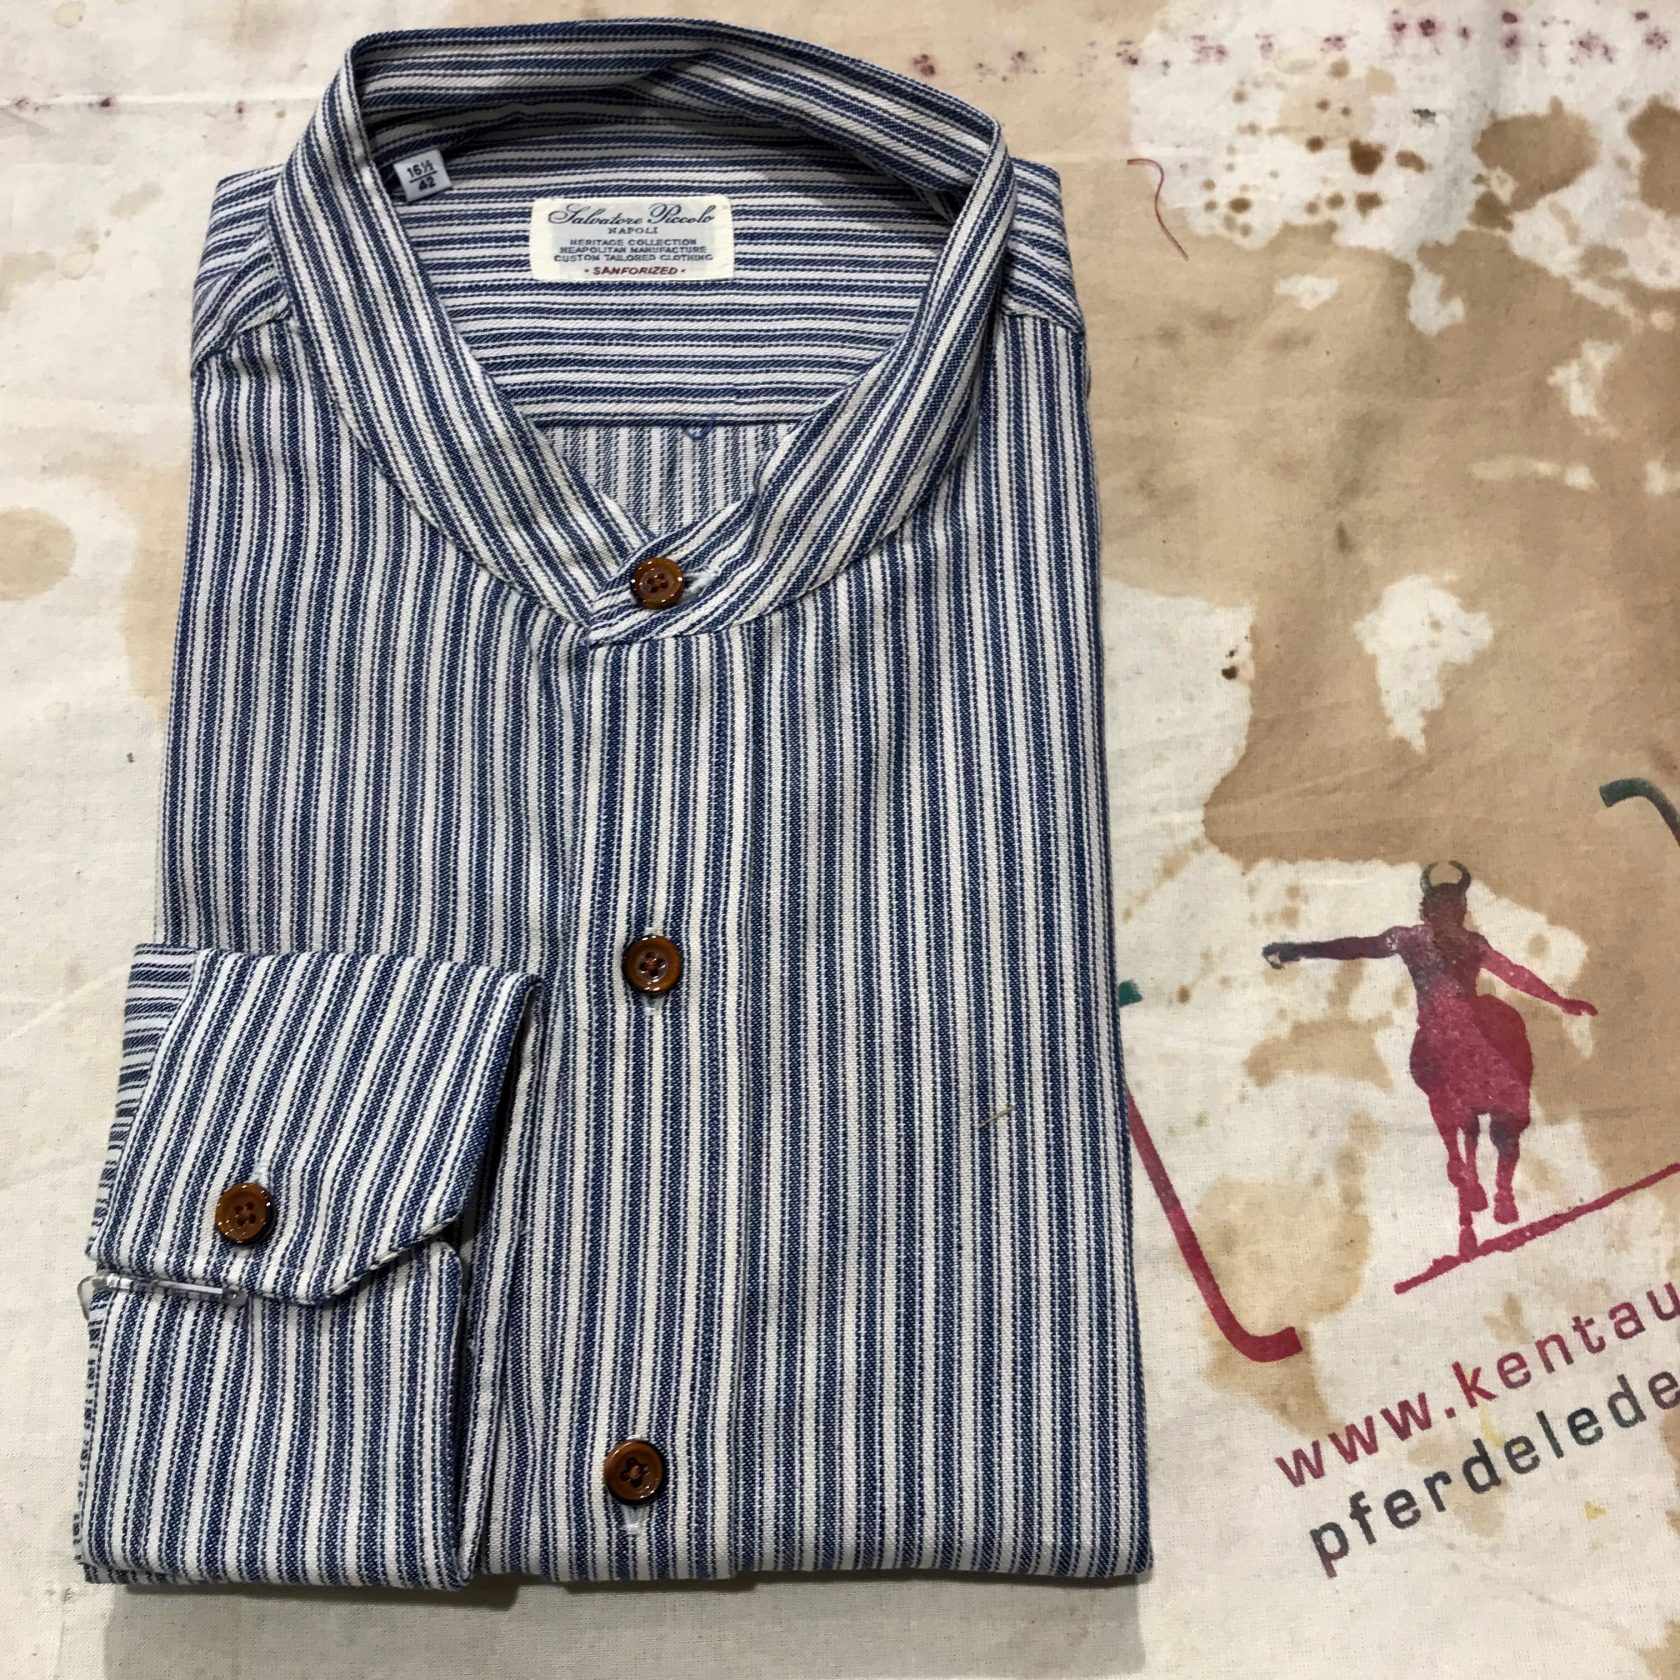 S. Piccolo TXP 714 H striped shirt